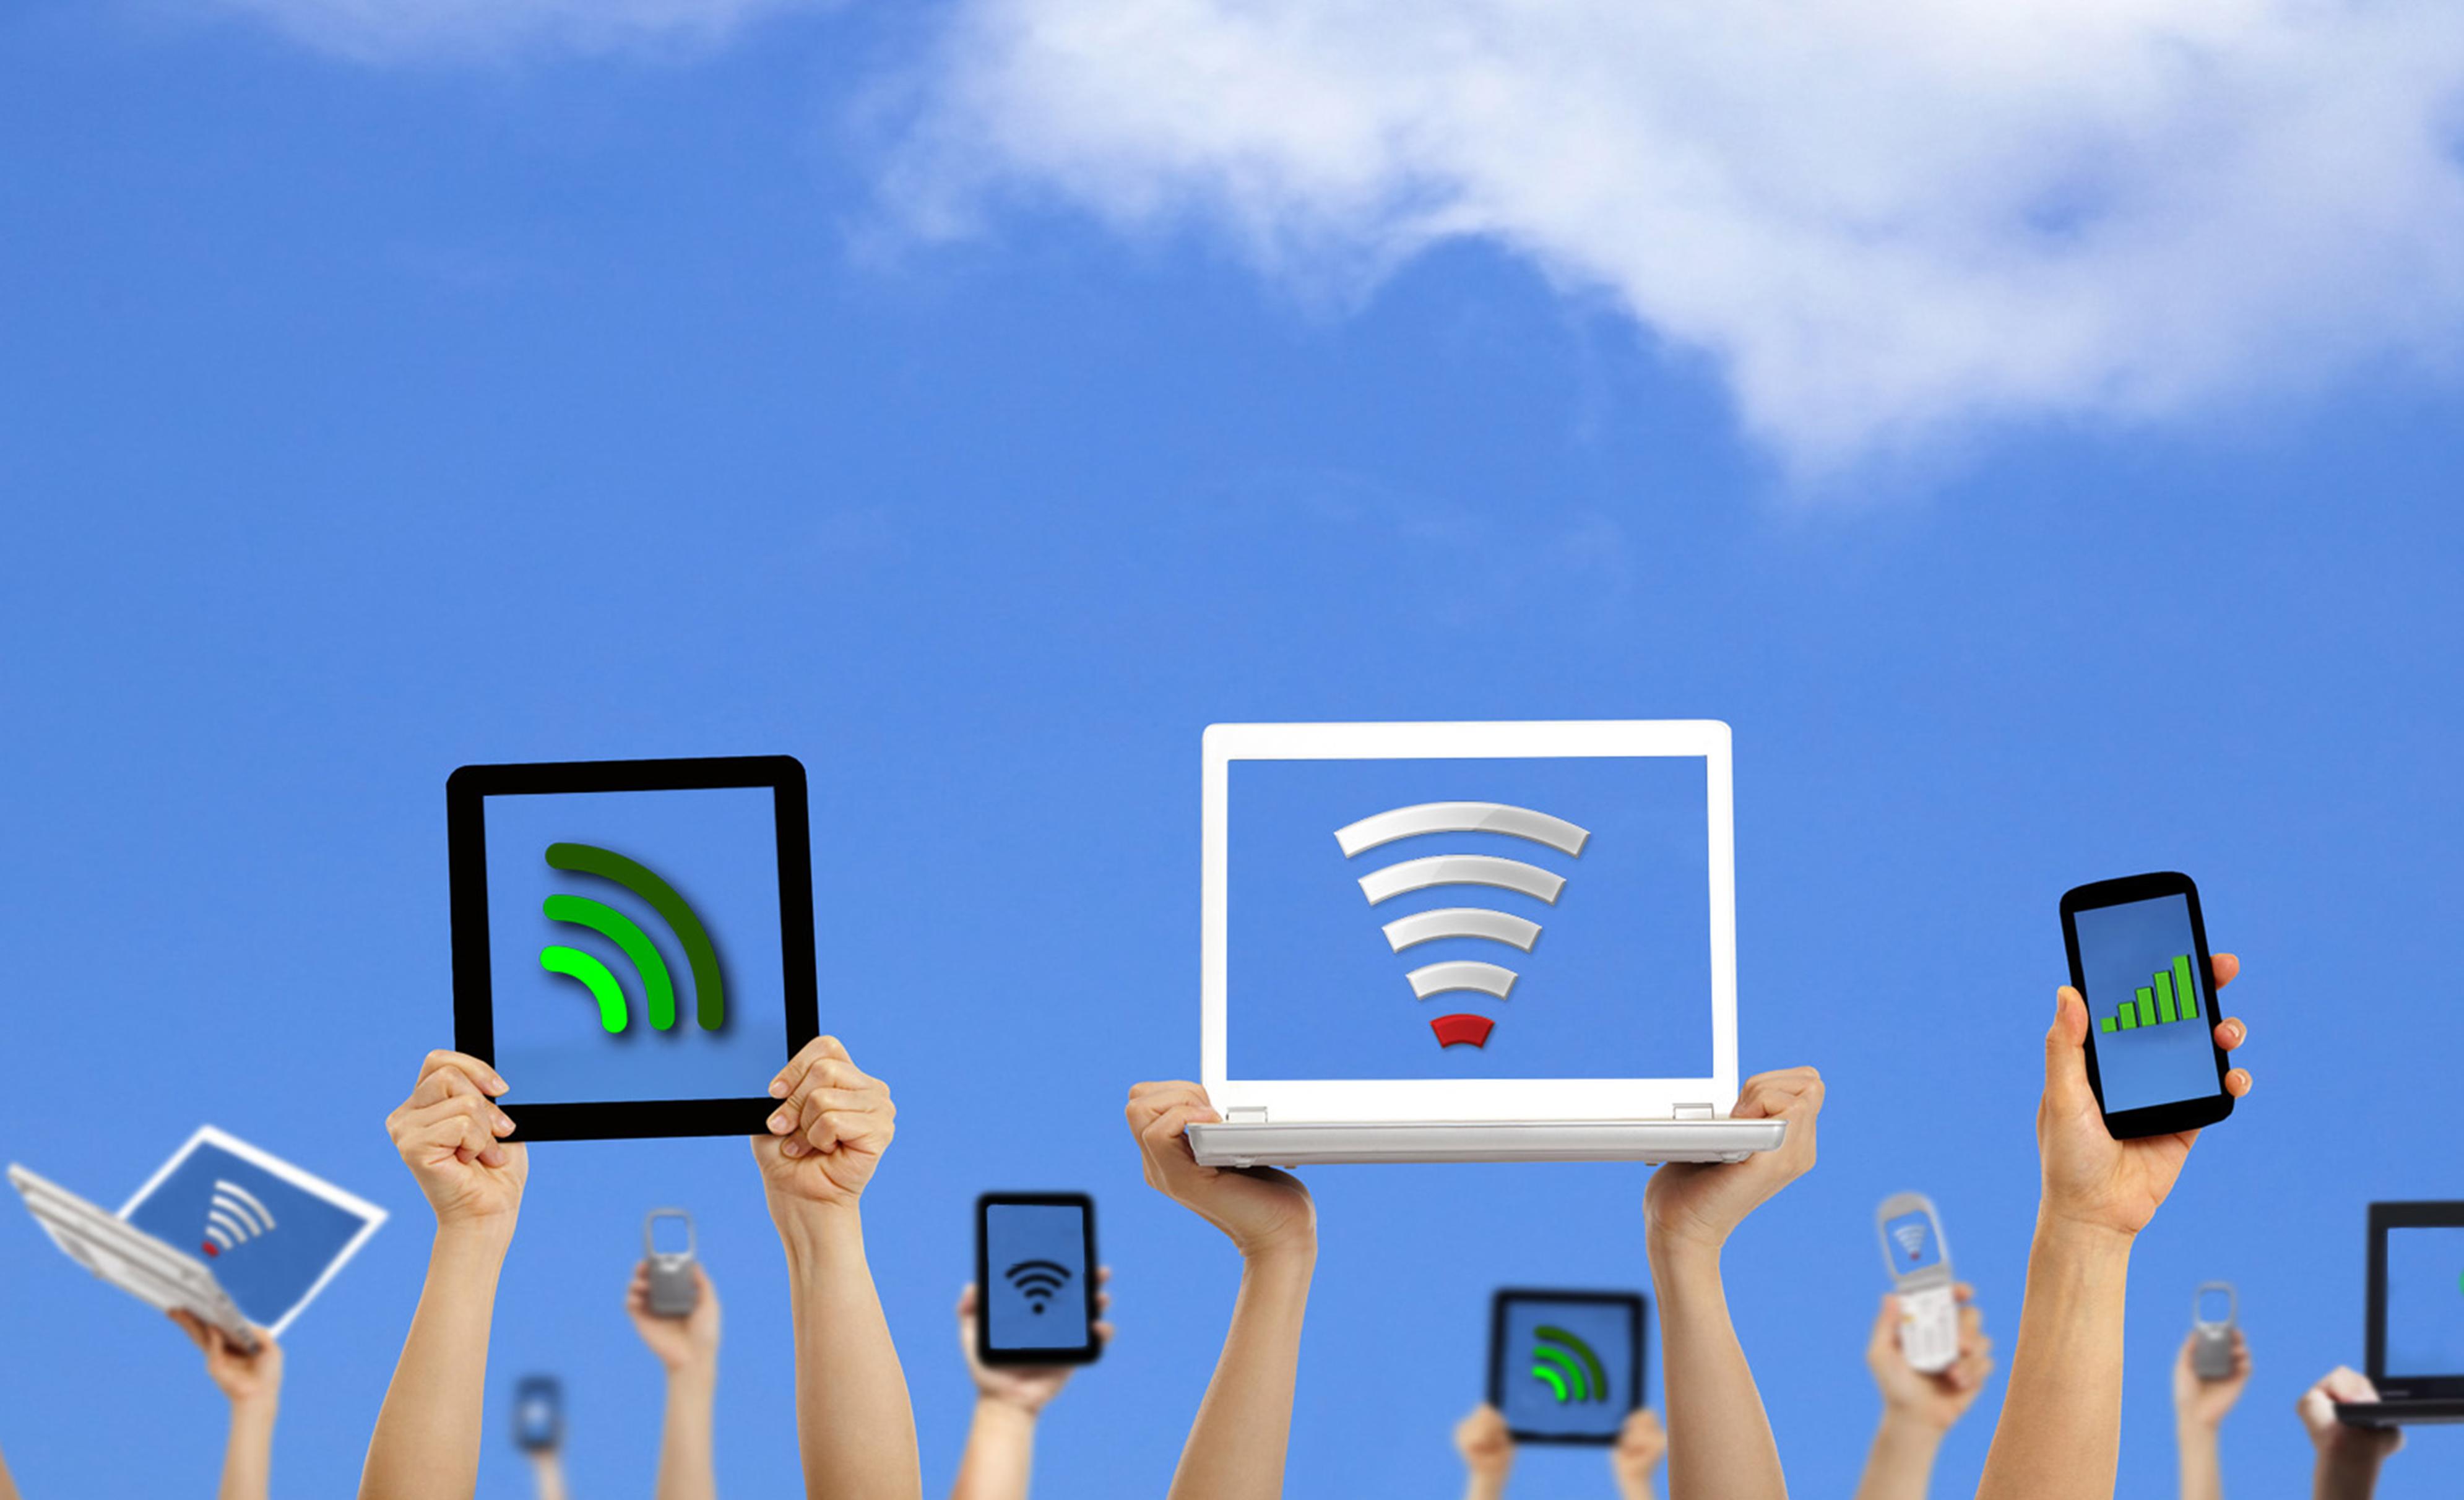 Draadloos Netwerk (Wi-Fi)